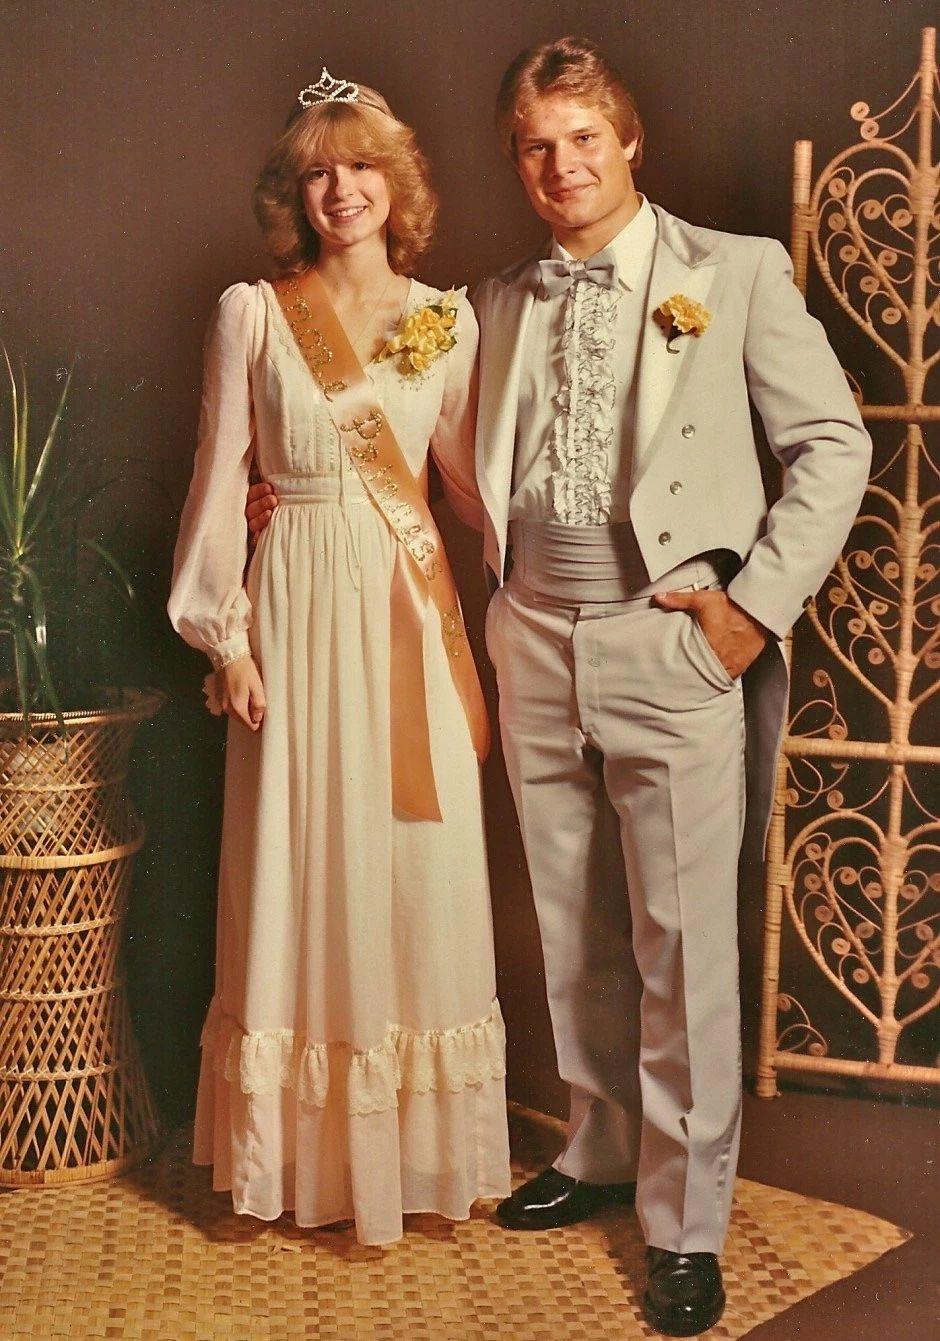 Pin By Bianca Castilho On Prom Pandemonium Prom Dresses Vintage Vintage Prom Prom Style [ 1341 x 940 Pixel ]